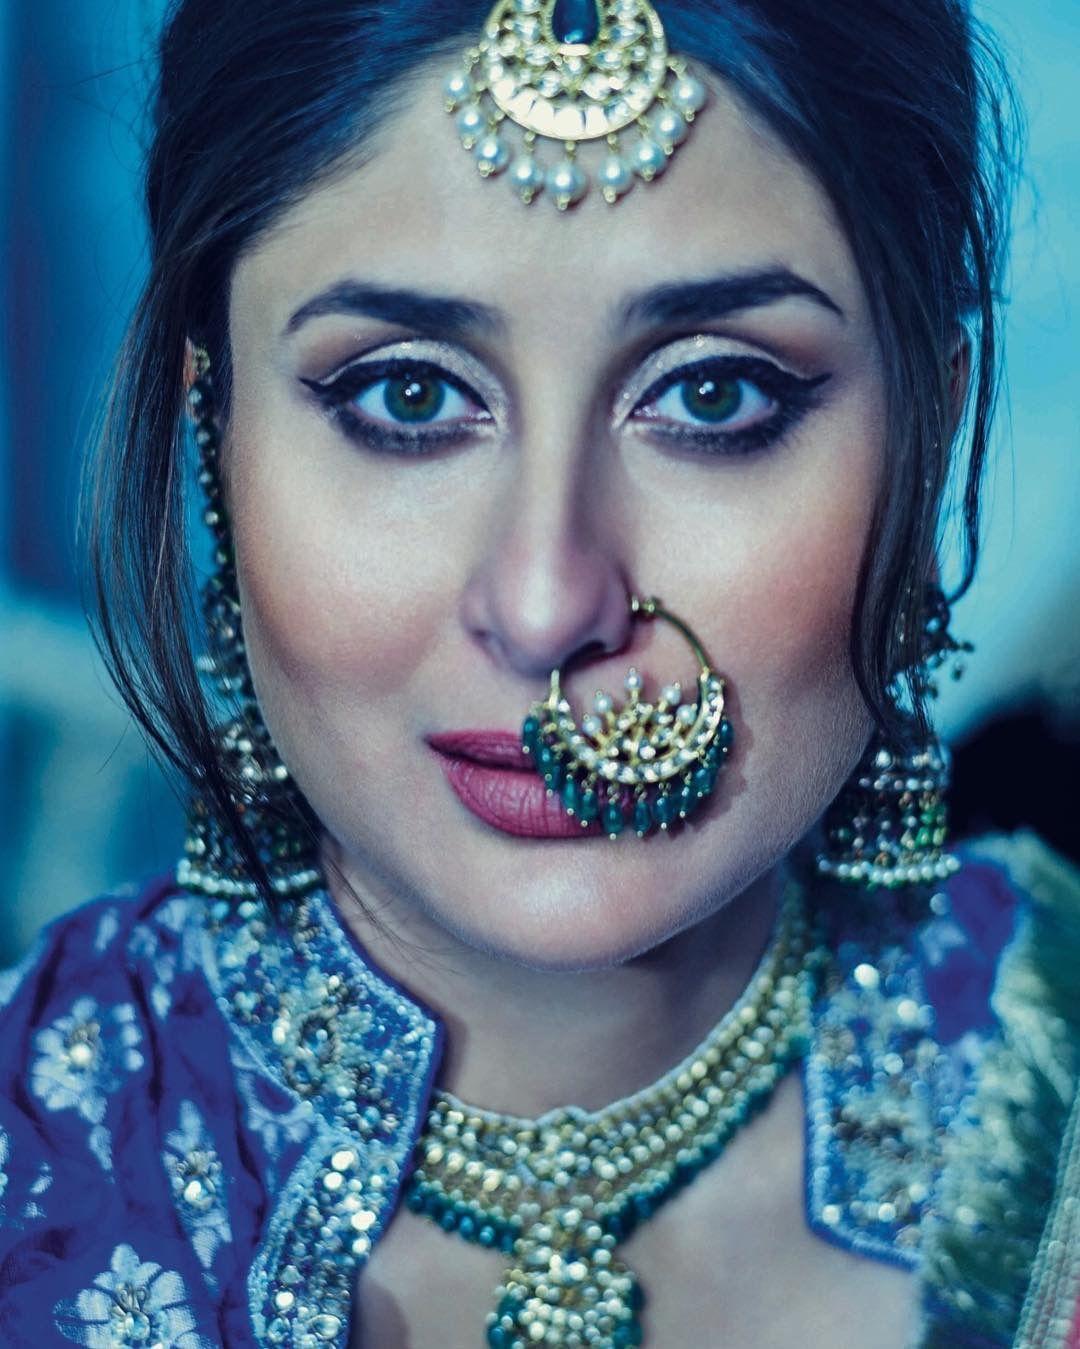 Kareena kapoor.   Indian beauty   Pinterest   Indian beauty and ...